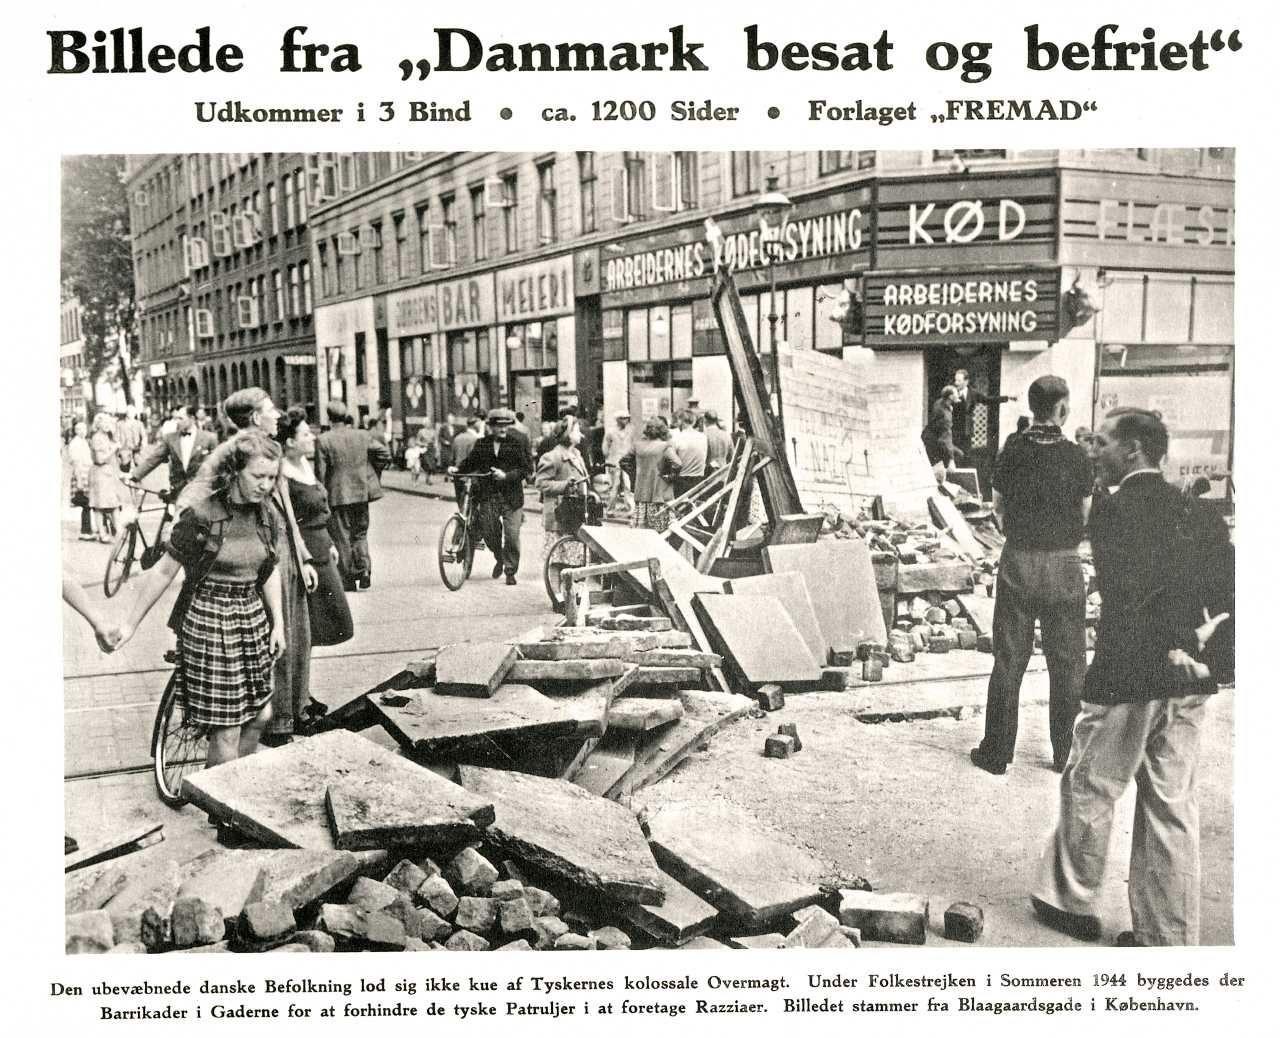 Folkestrejken 1944 Foto: Nationalmuseet, Danmark. Licens: No known rights.